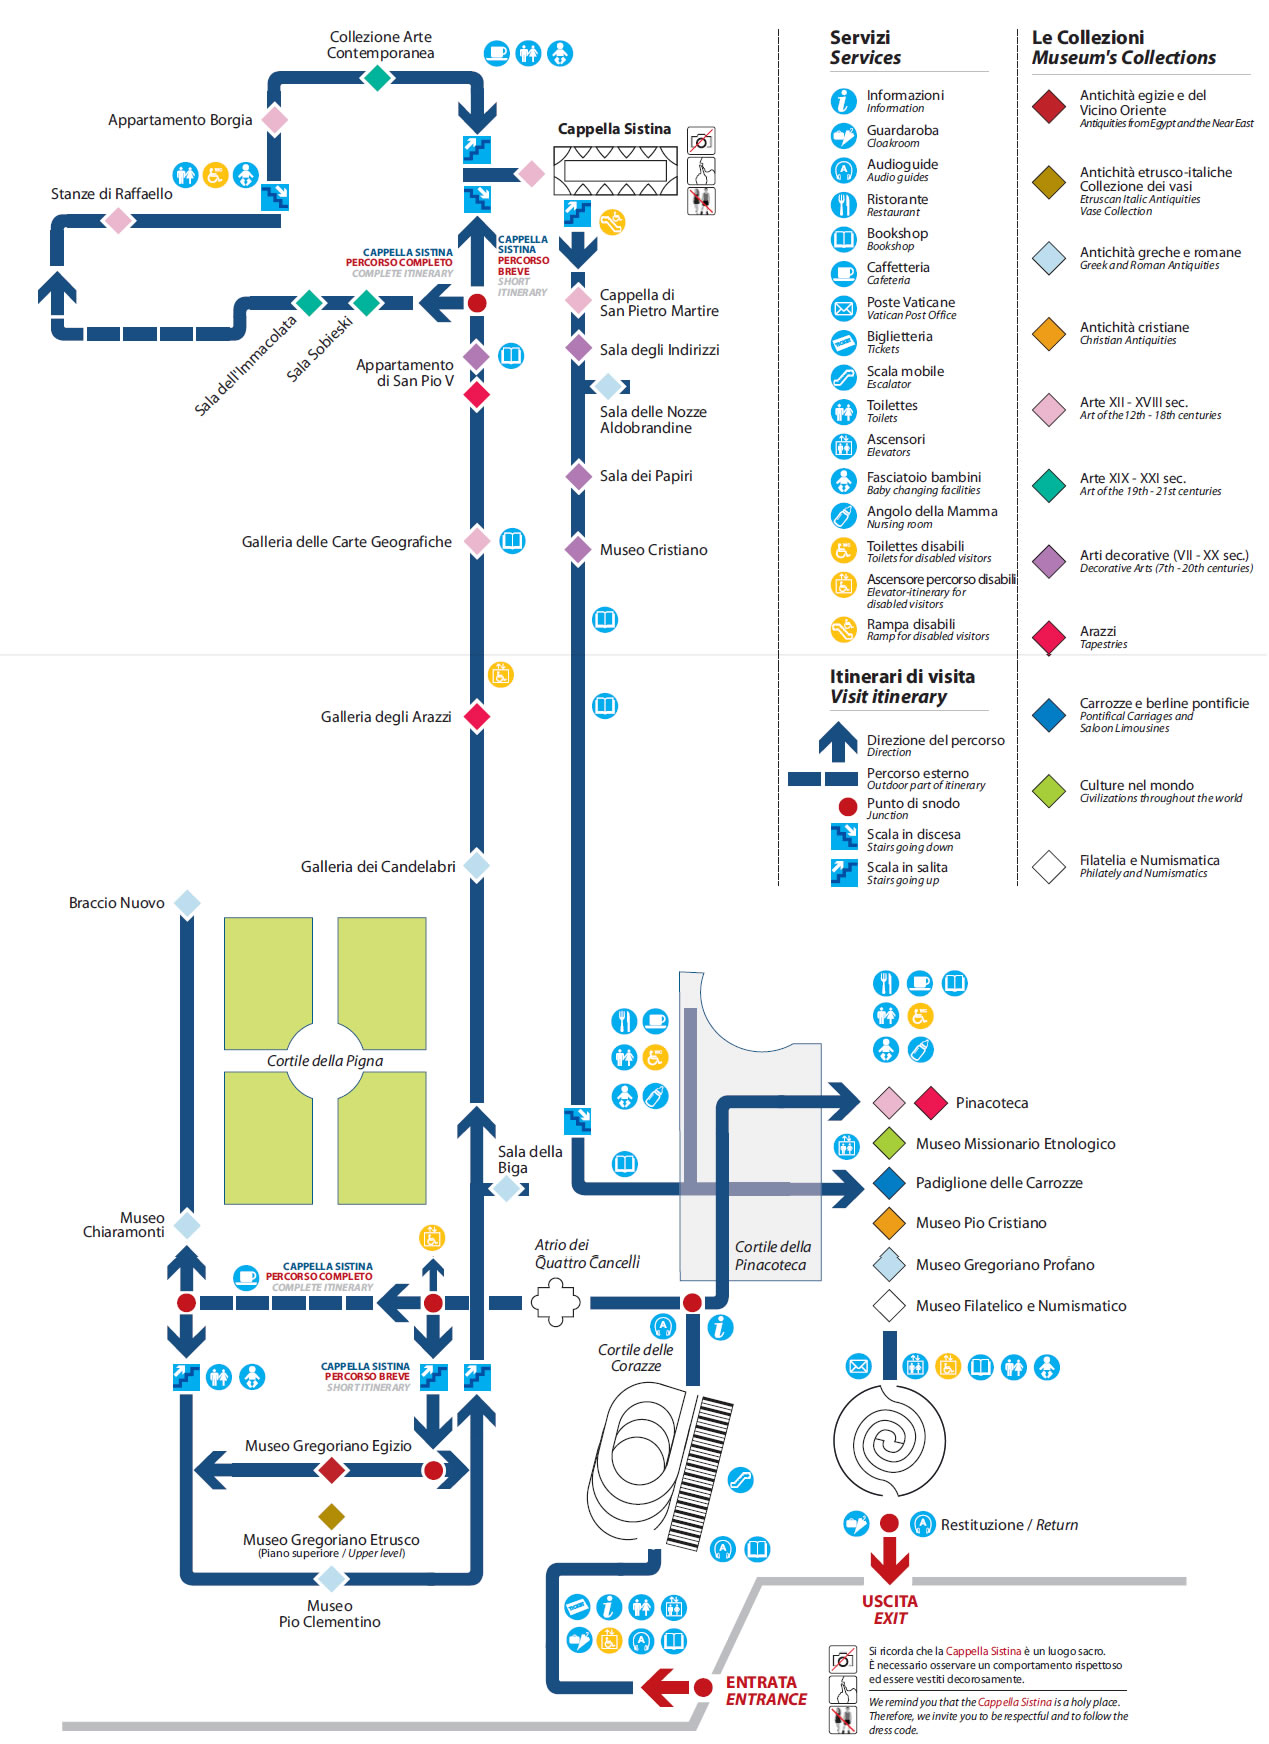 Mapa_MuseudoVaticano